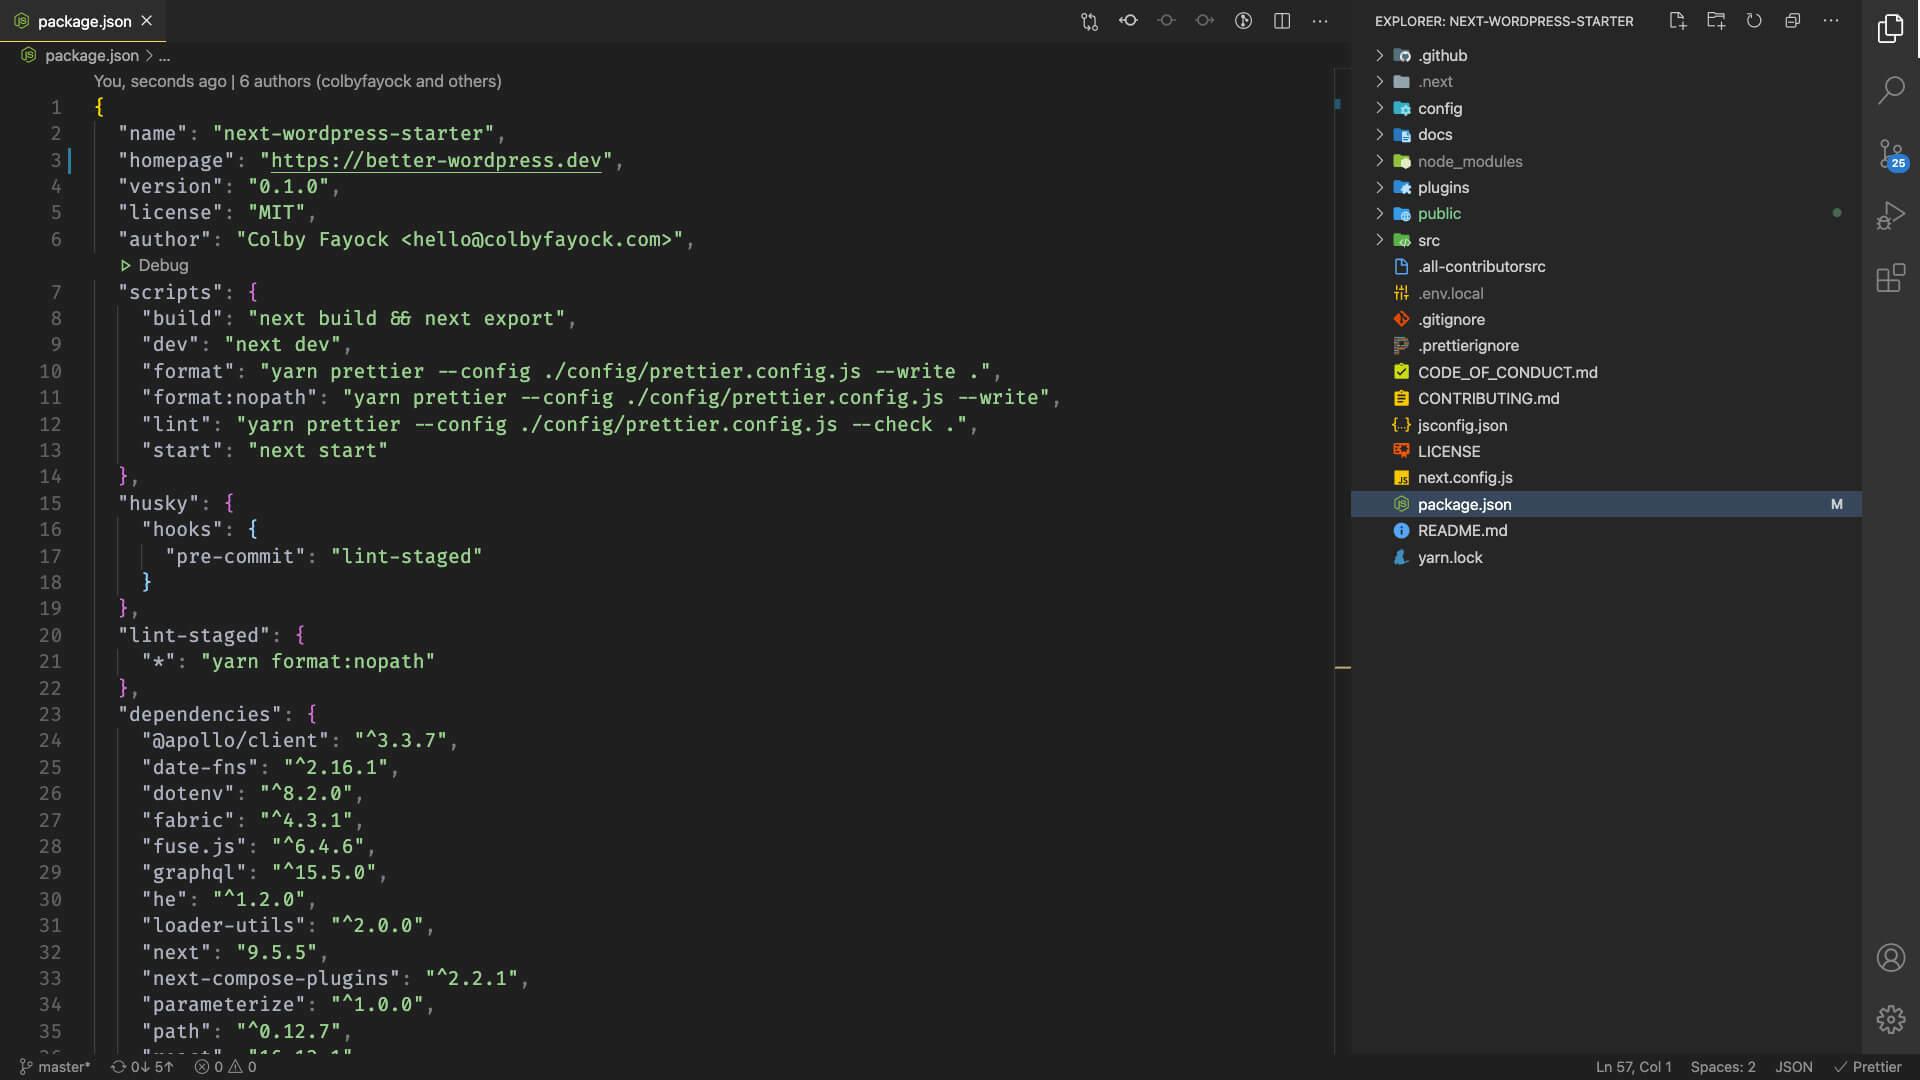 Screenshot of package.json file